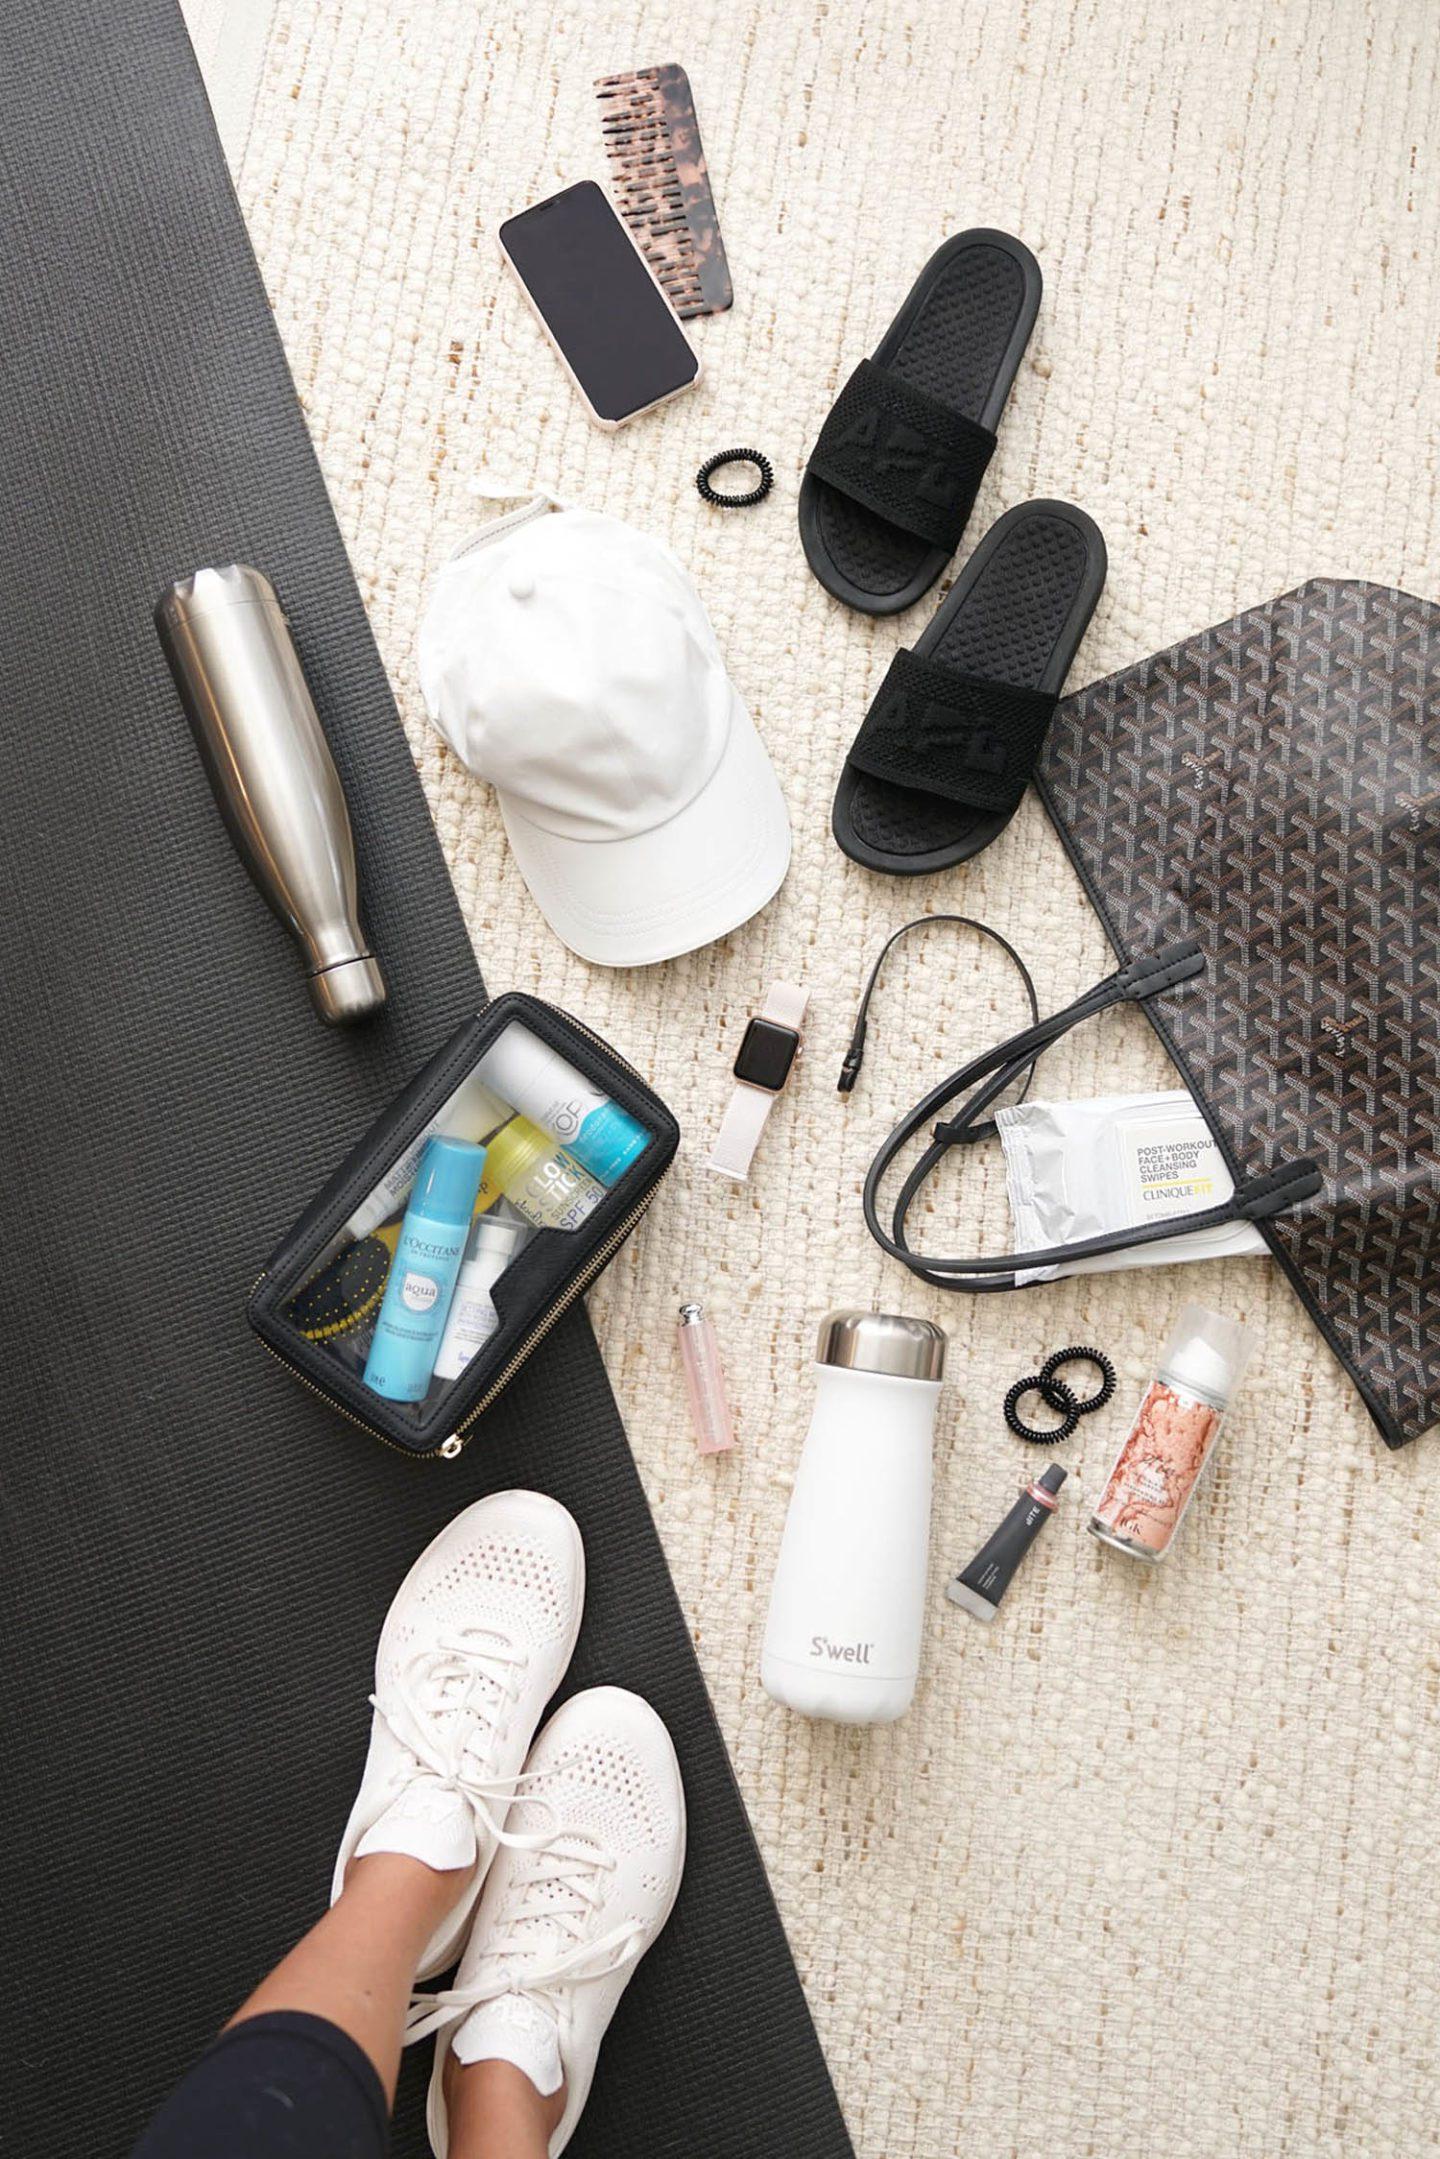 Gym Bag Essentials | S'Well Bottles, APL Slides, Kopari Deodorant, Supergoop Sunscreen